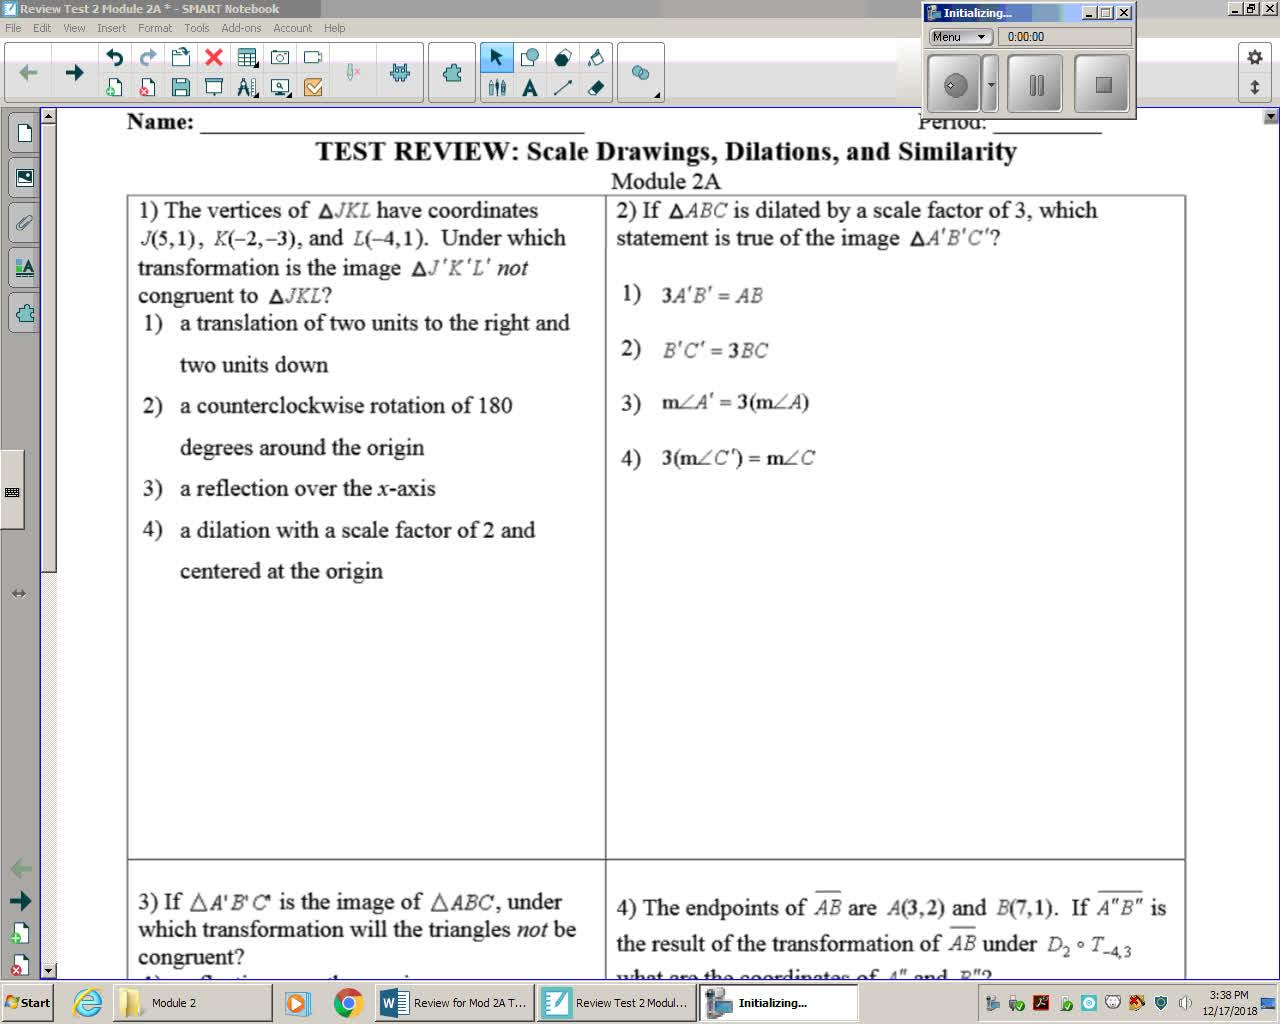 Review for Exam Mod 2 L1-6